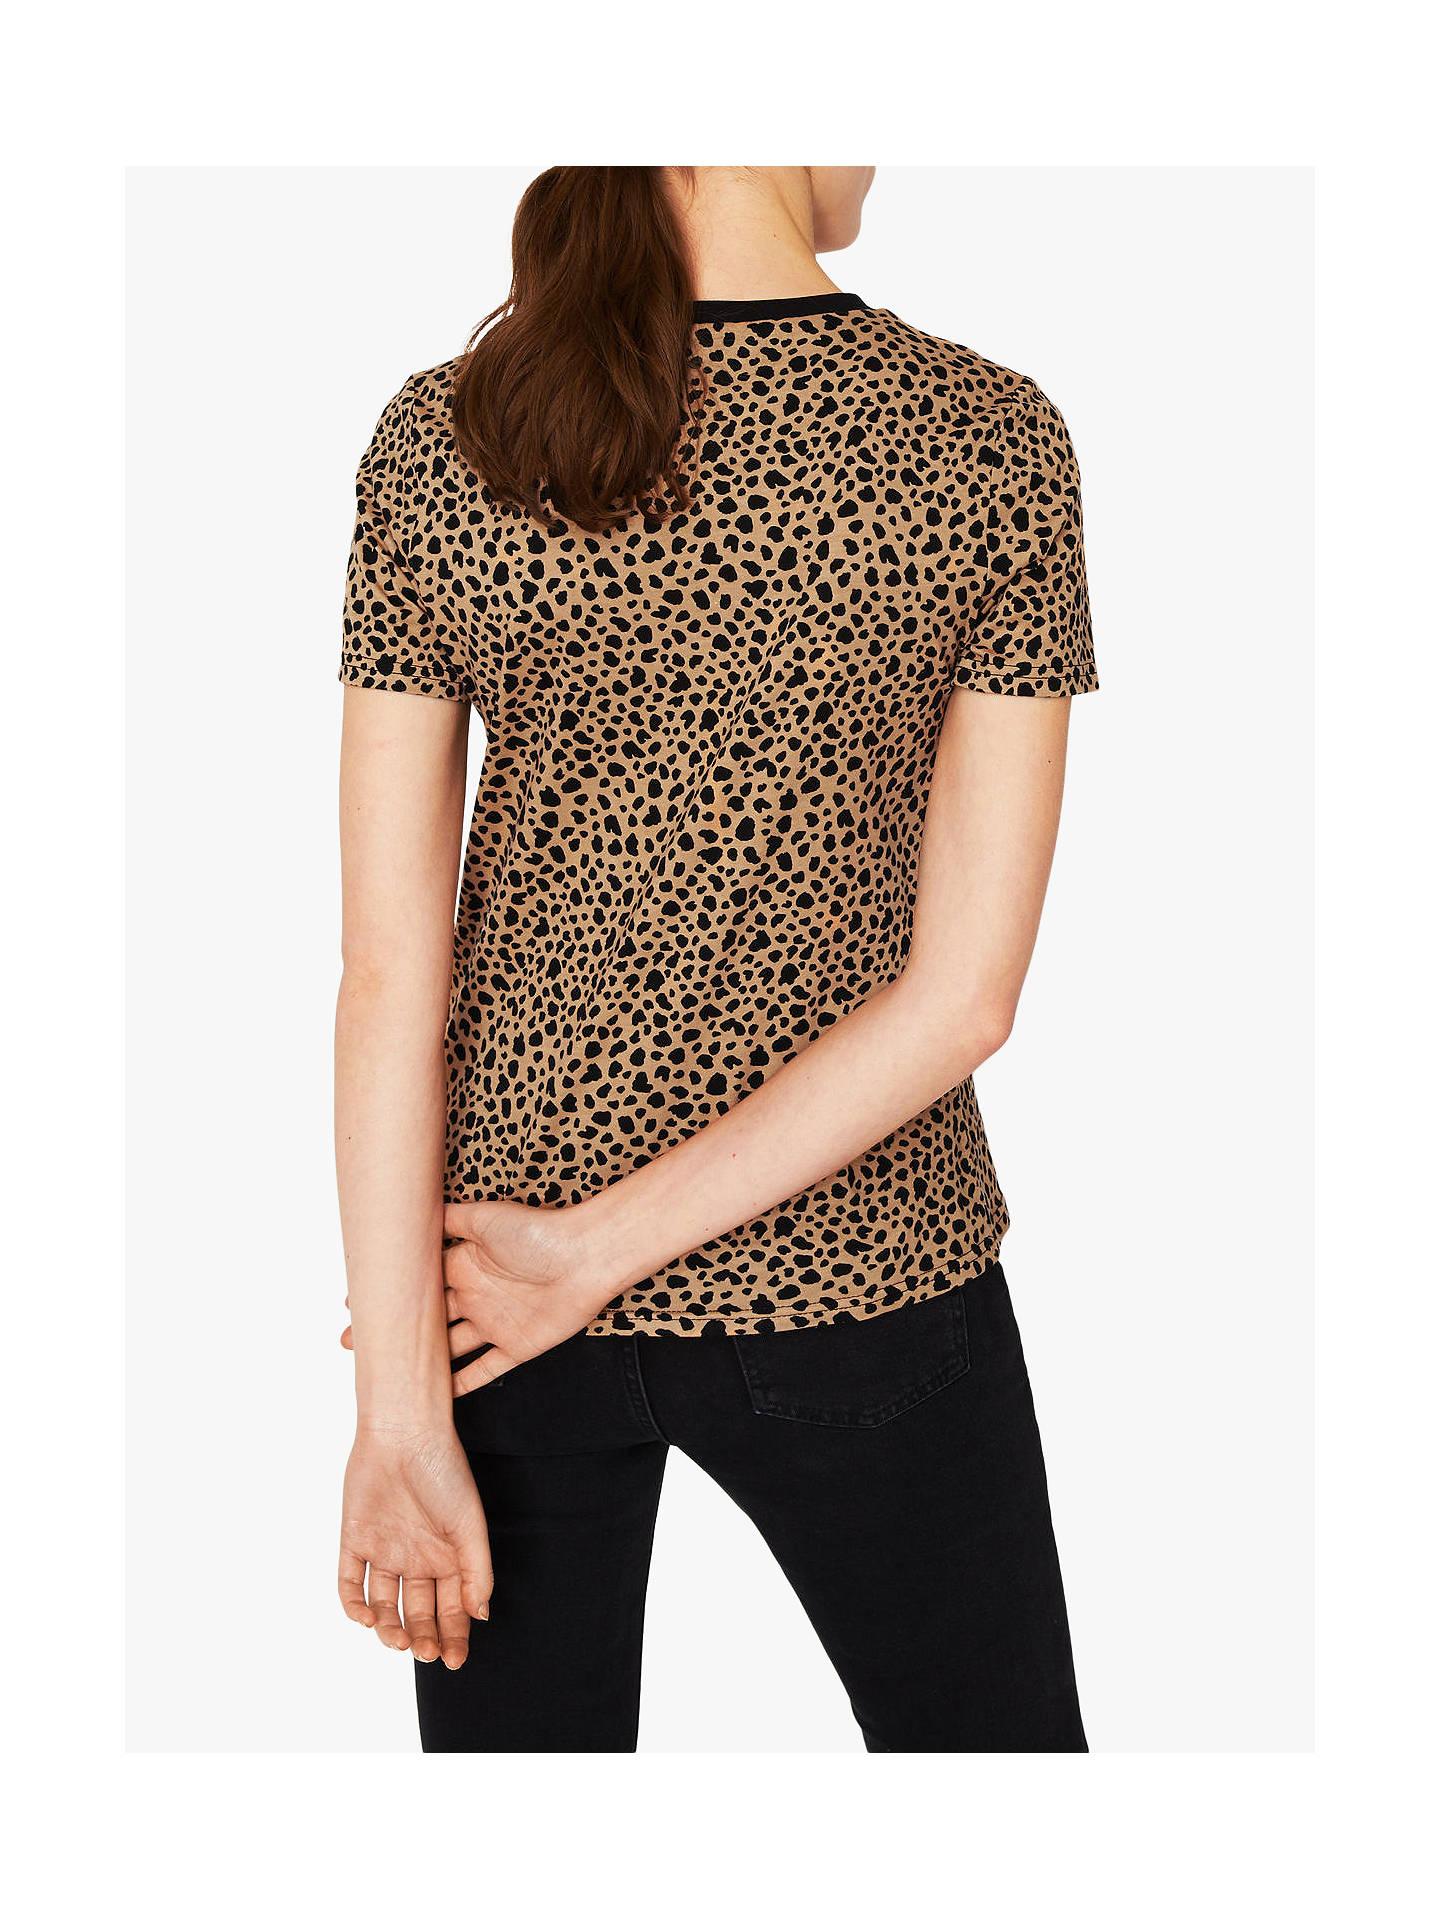 571037ac1b6e ... Buy Warehouse Cheetah Print T-Shirt, Brown, 14 Online at johnlewis.com  ...